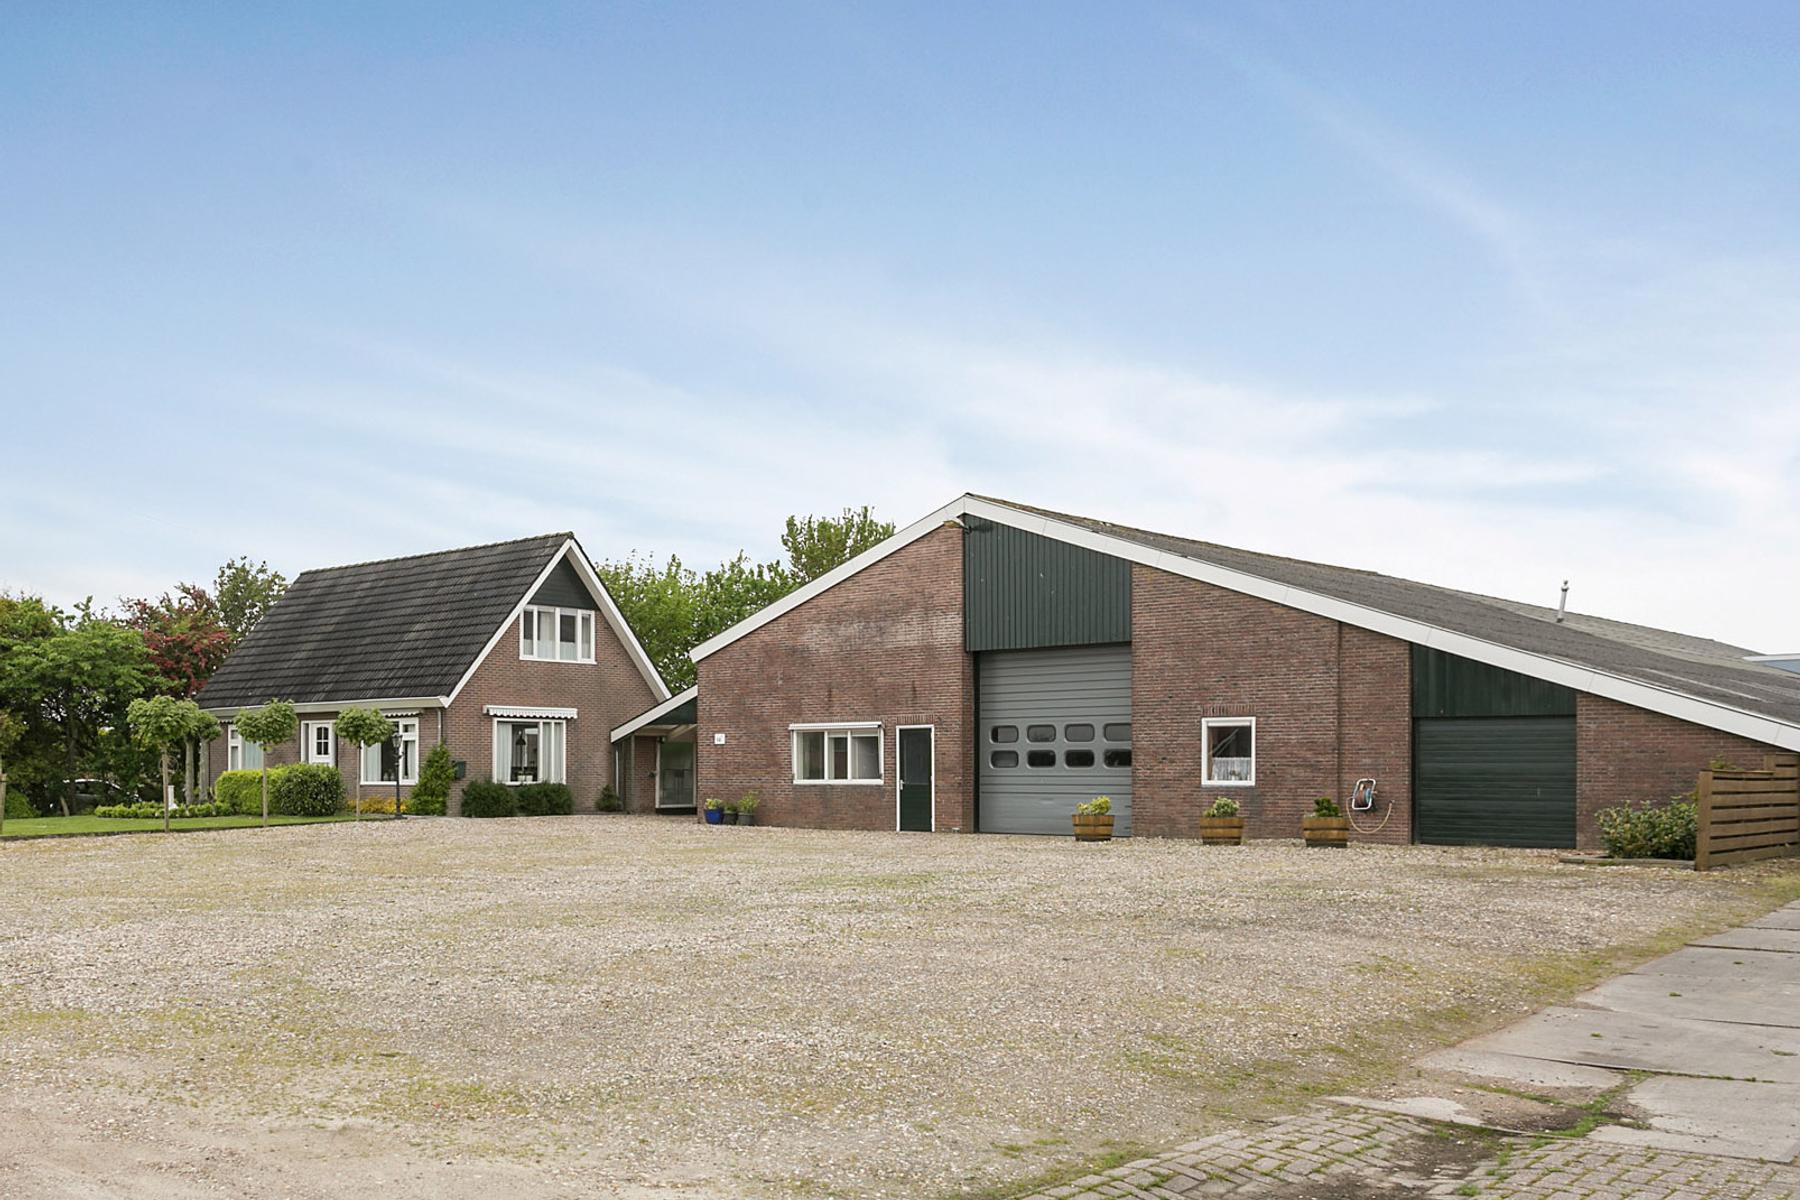 ede2fd2ecd0 Holwerterdyk 14 A in Ternaard 9145 RK: Bedrijfsruimte te koop ...